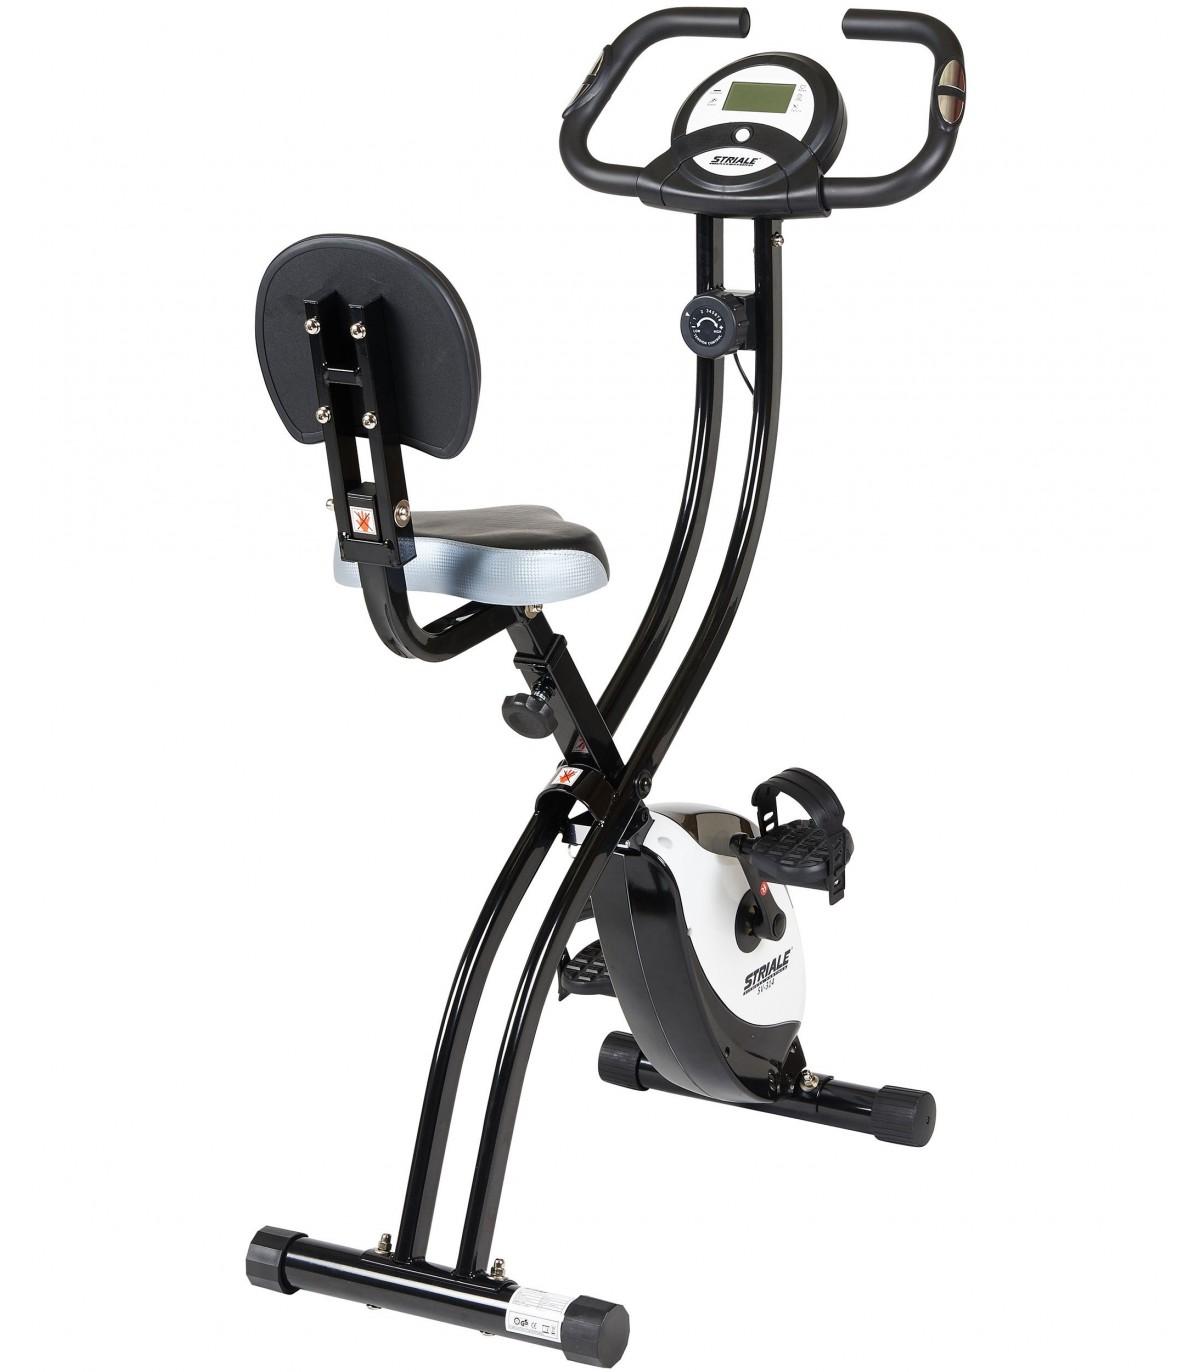 Vélo Dappartement Pliable Sv 314 Care Fitness